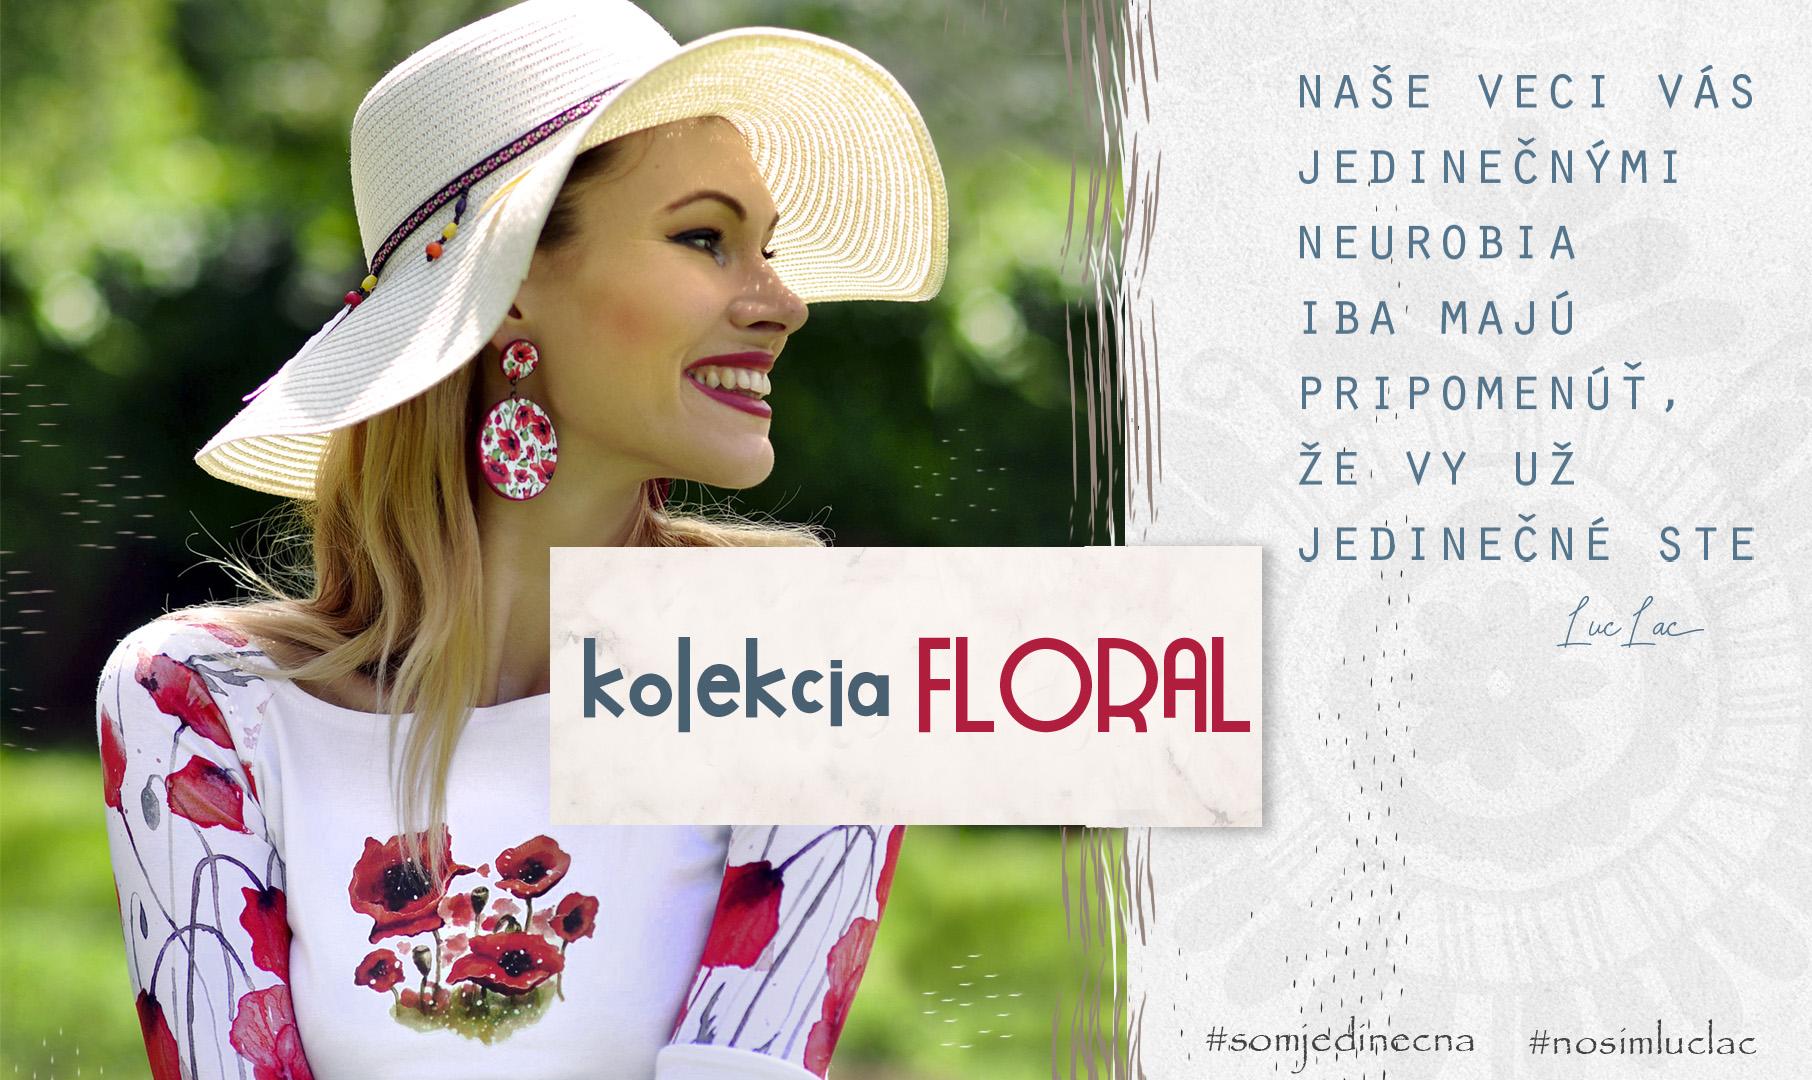 LucLac kolekcia floral